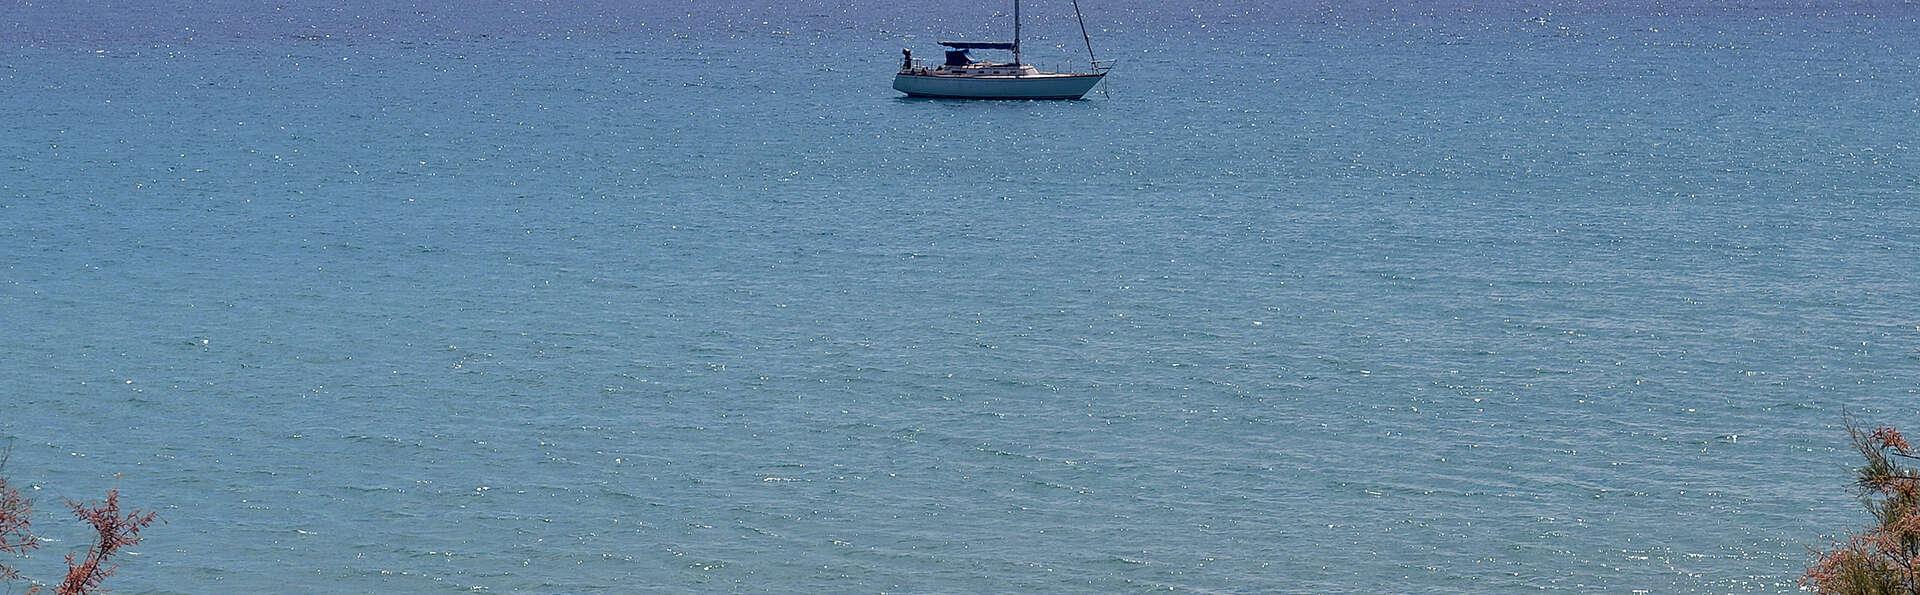 Flots Bleus - Edit_Destination2.jpg